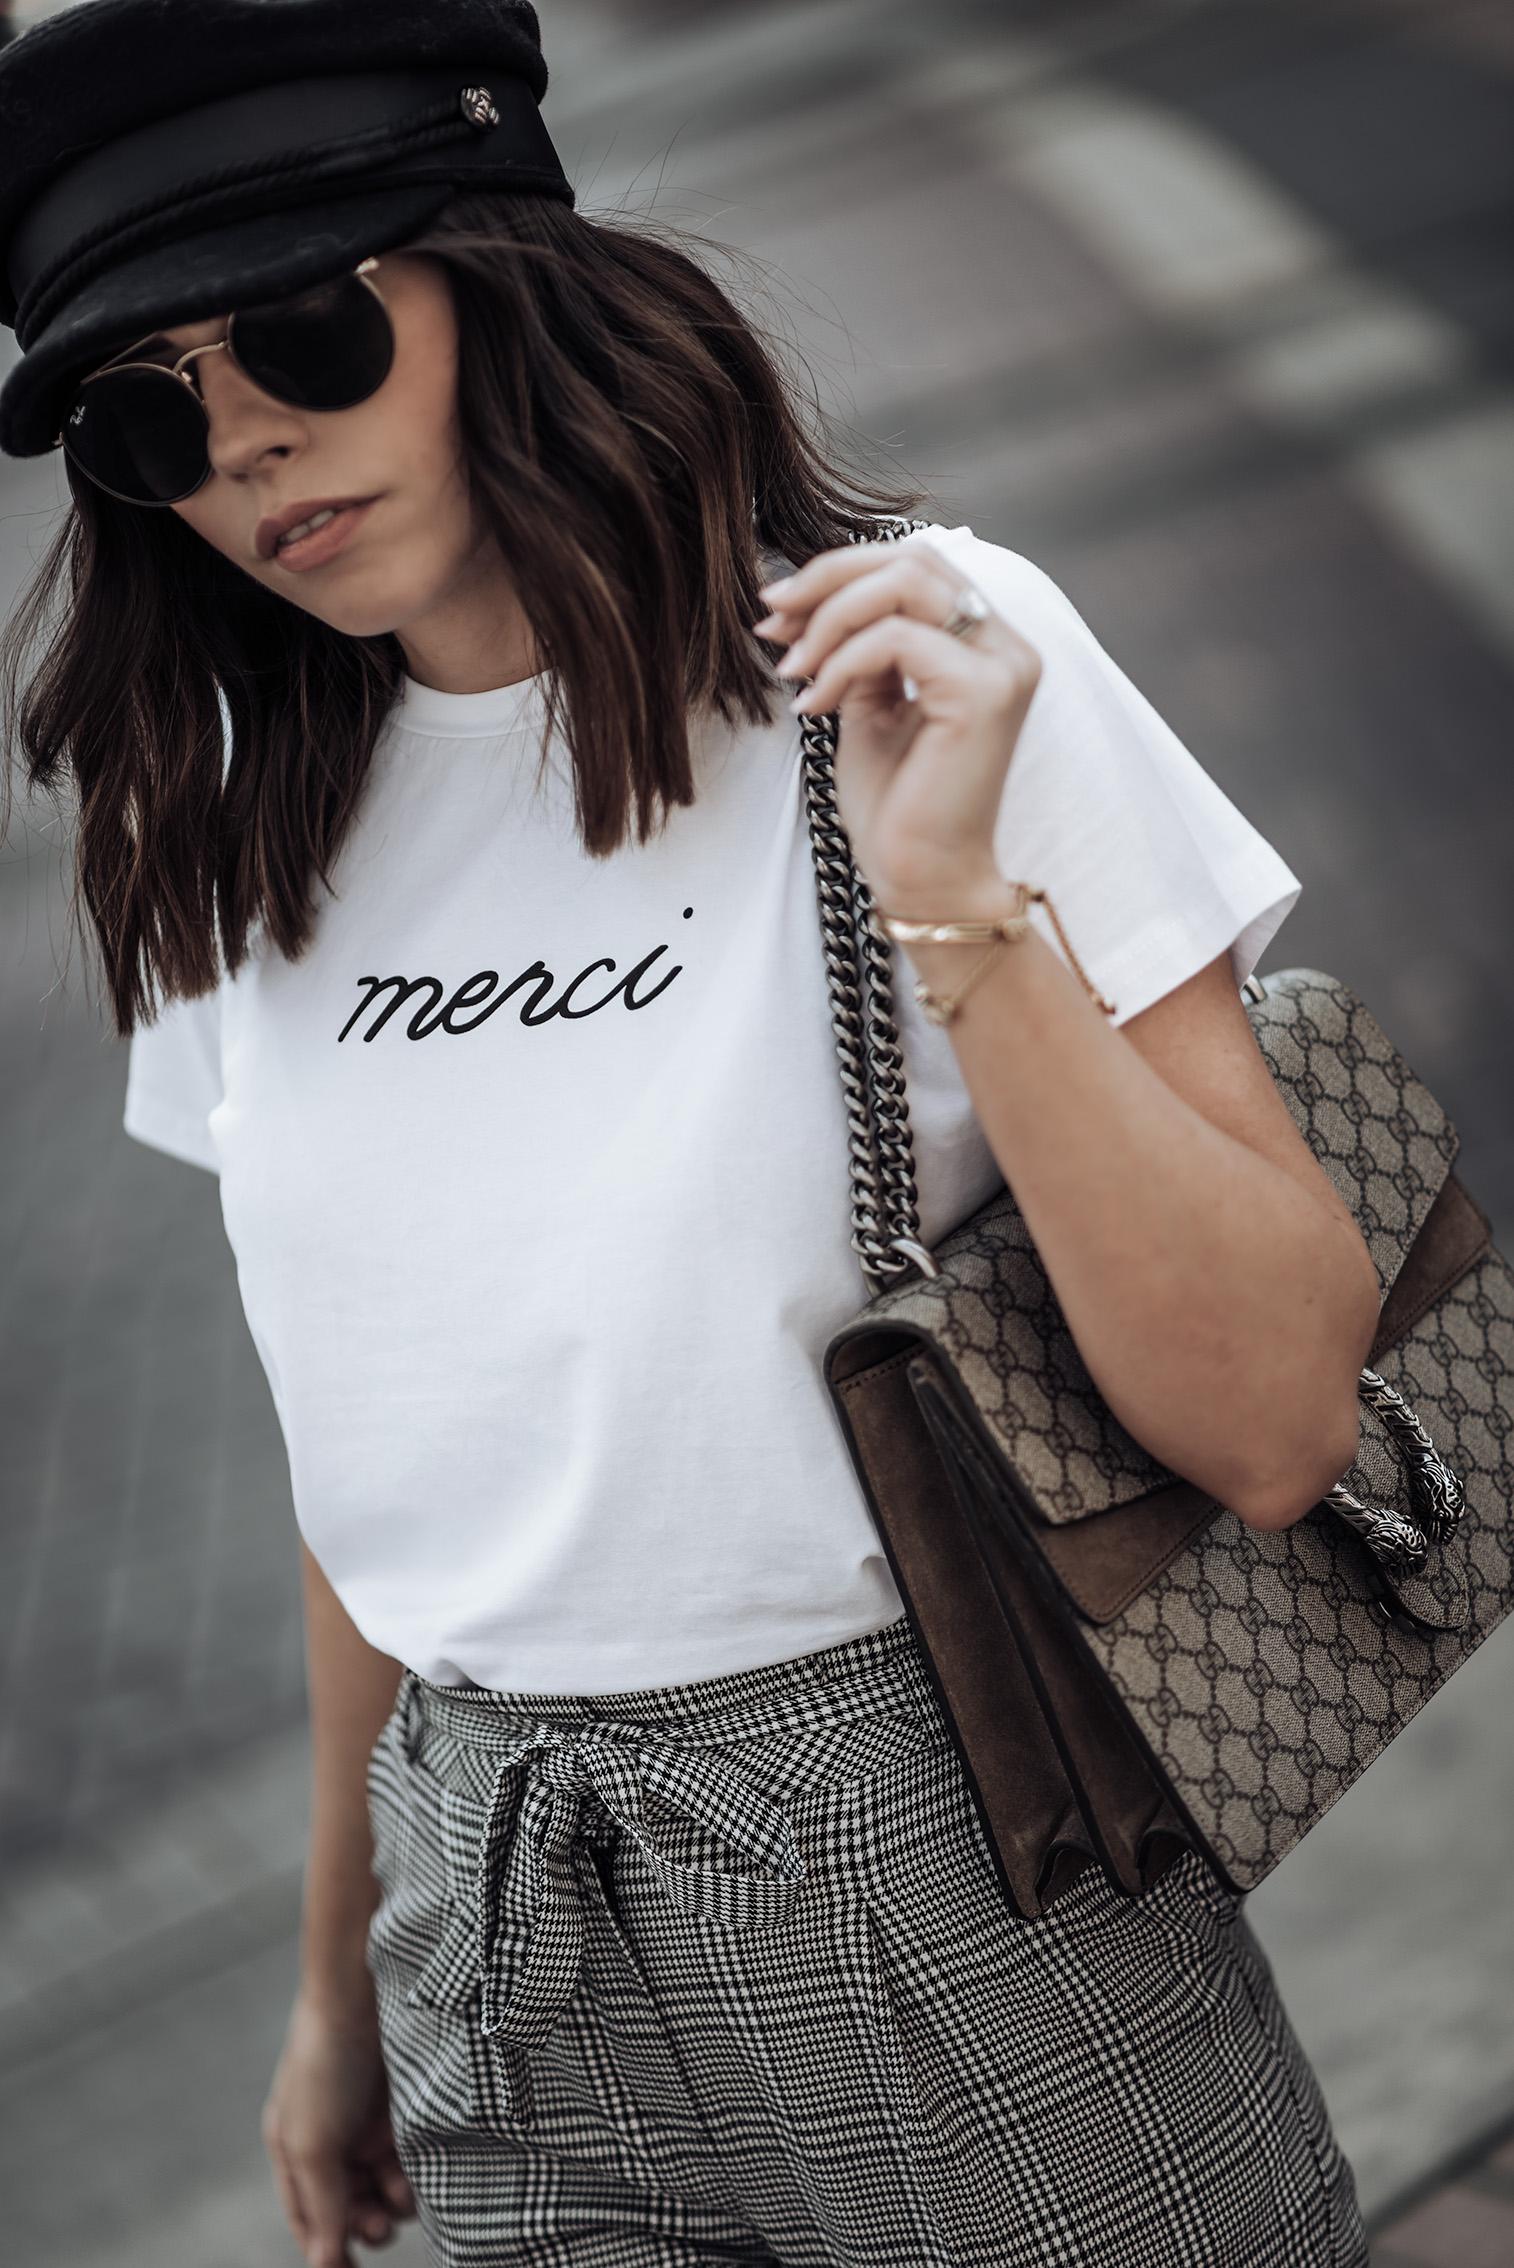 Check print | Merci Beaucoup tee | Check pants (Topshop, similar here) | Cap | Superga Platform sneakers | Gucci Dionysus #streetstyle #checkprint #sneakeroutfits #bakershat #liketkit #shopstyle